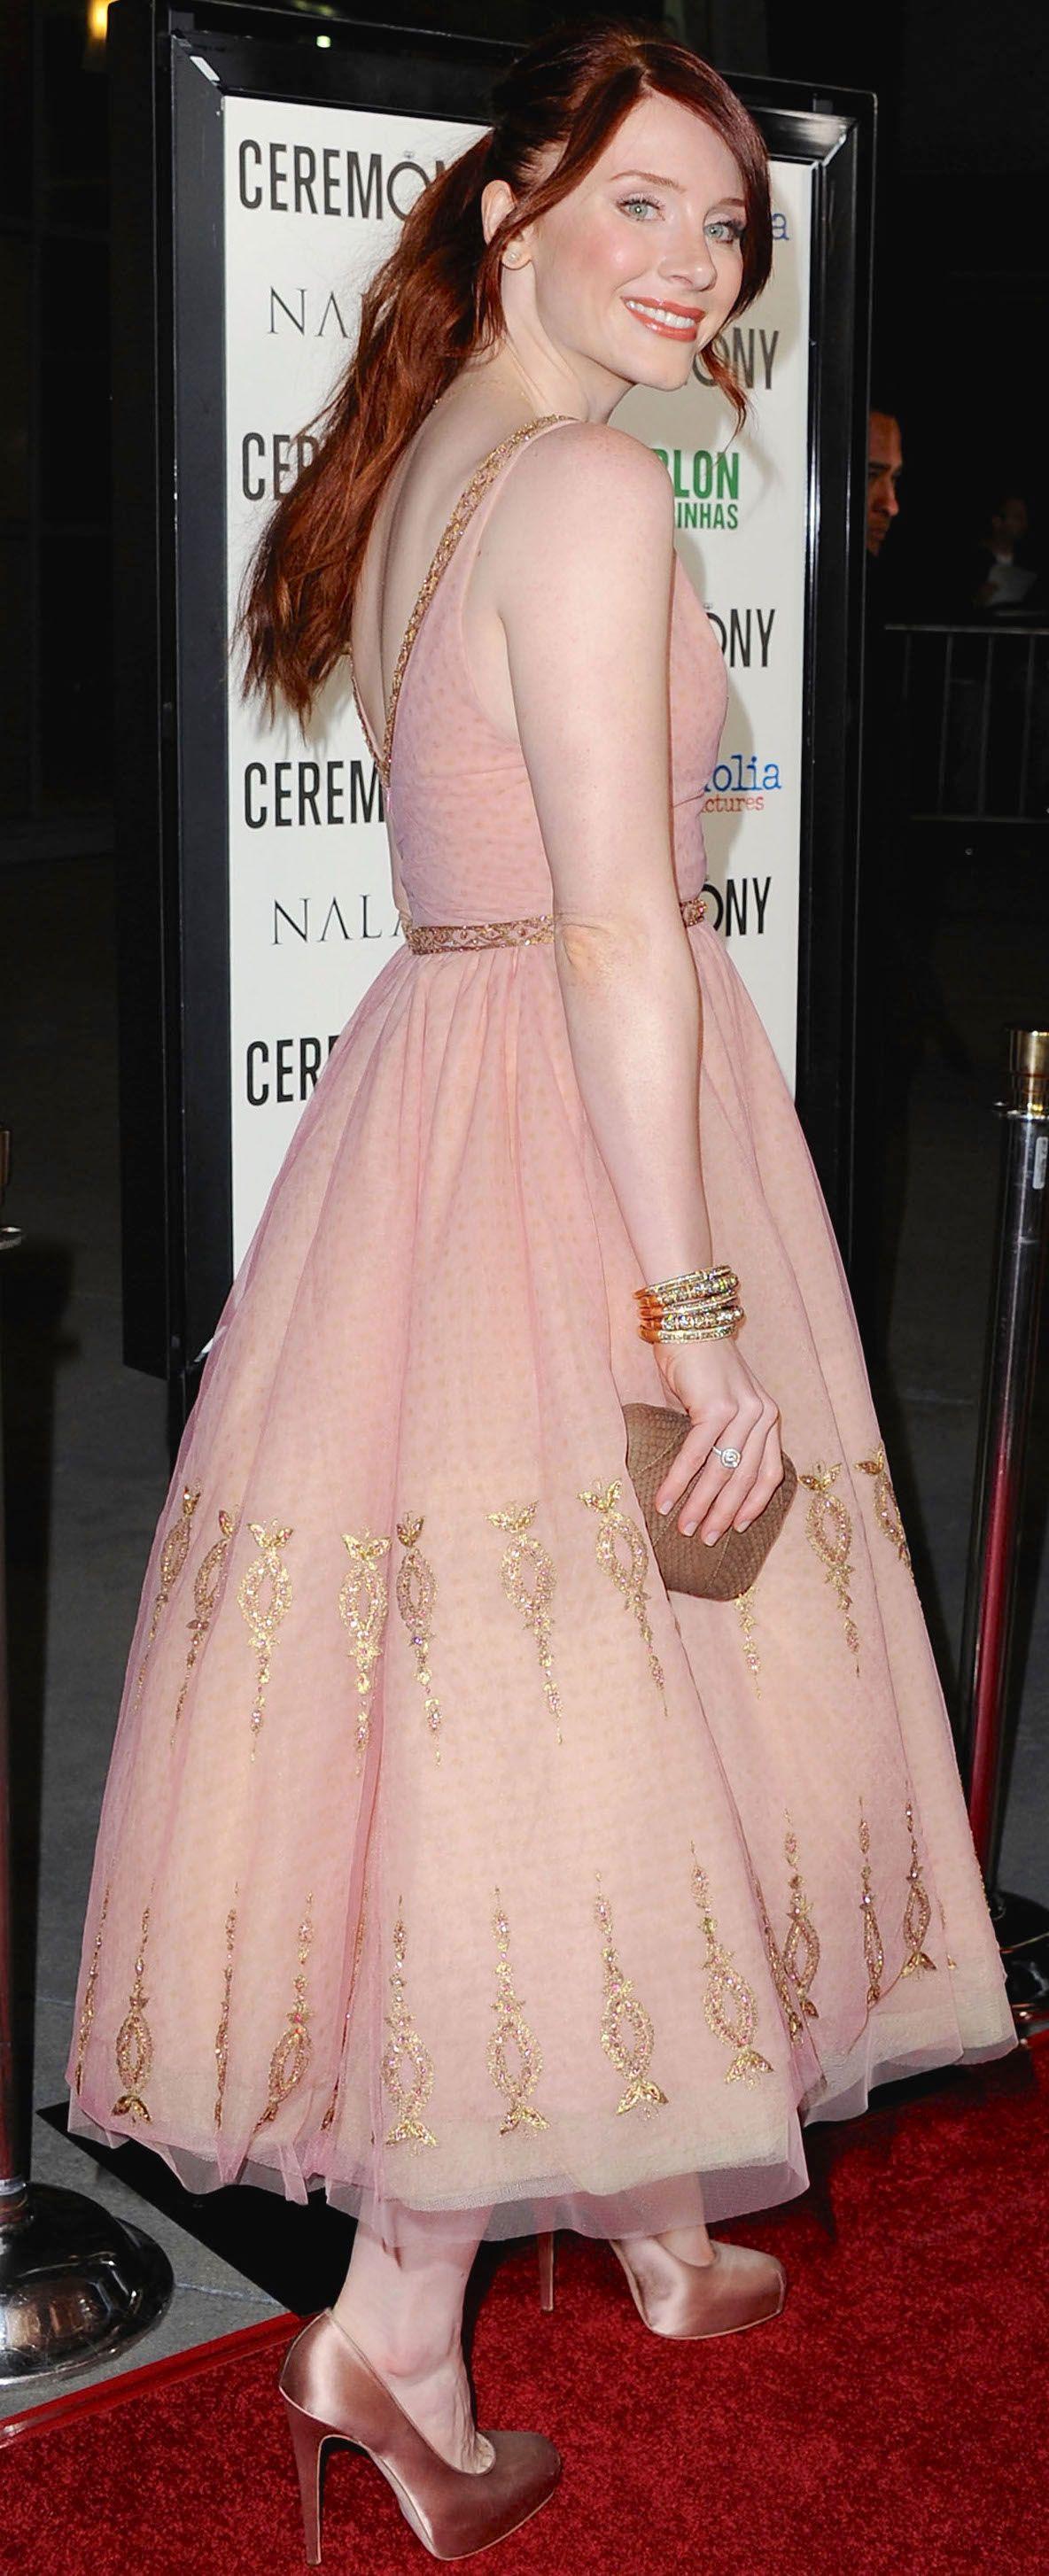 Bryce Dallas Howard in Reem Acra   Fashion   Pinterest   Actors ...